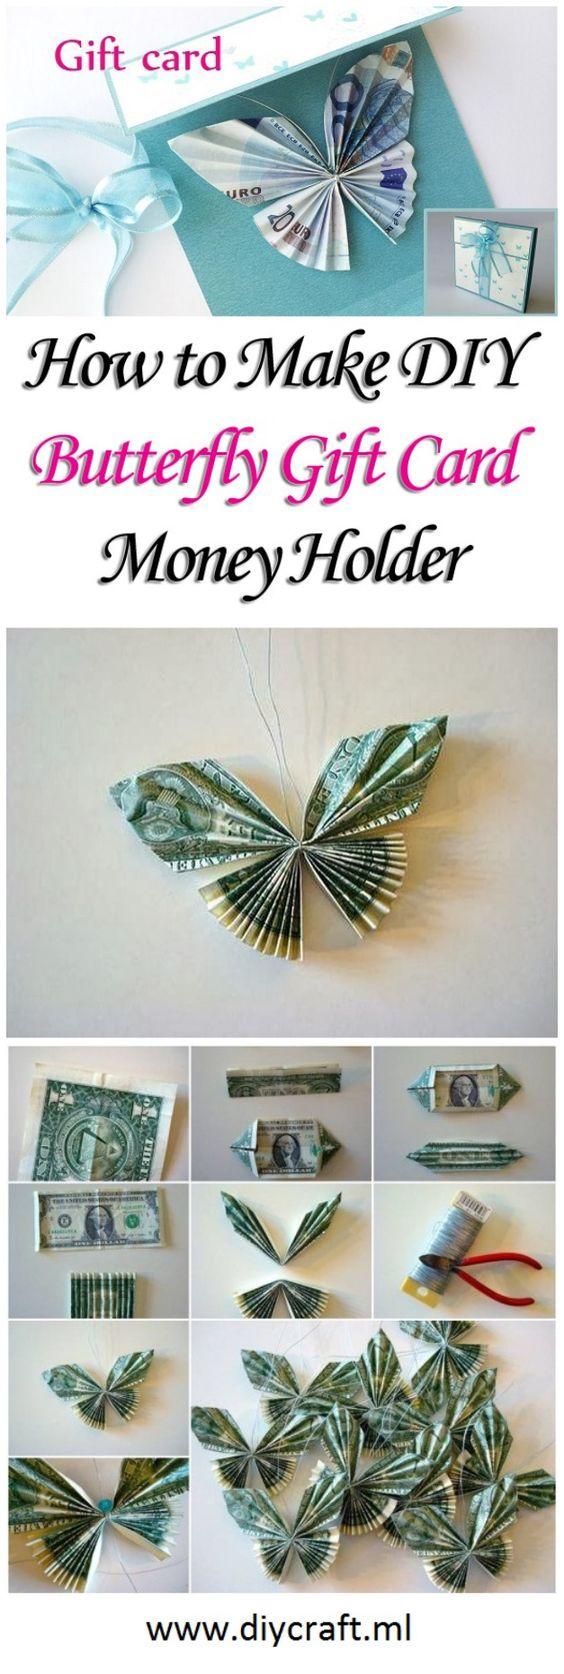 Make DIY Butterfly Gift Card Money Holder                                                                                                                                                     More